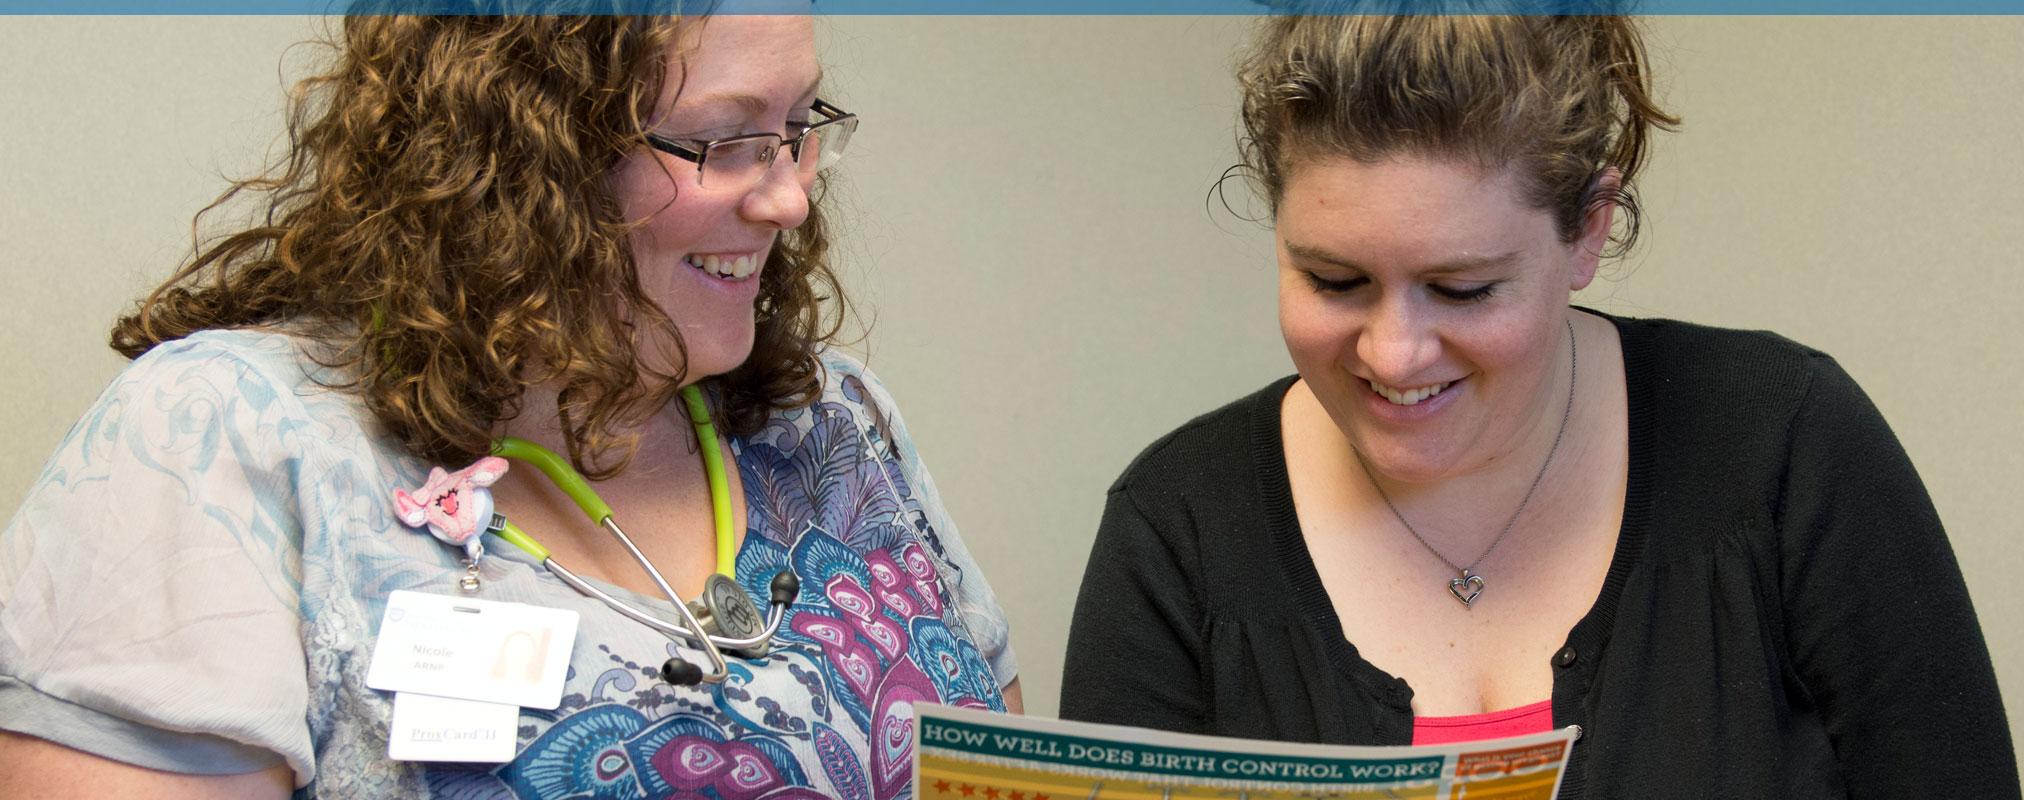 Birth Control - Eastern Iowa Health Center